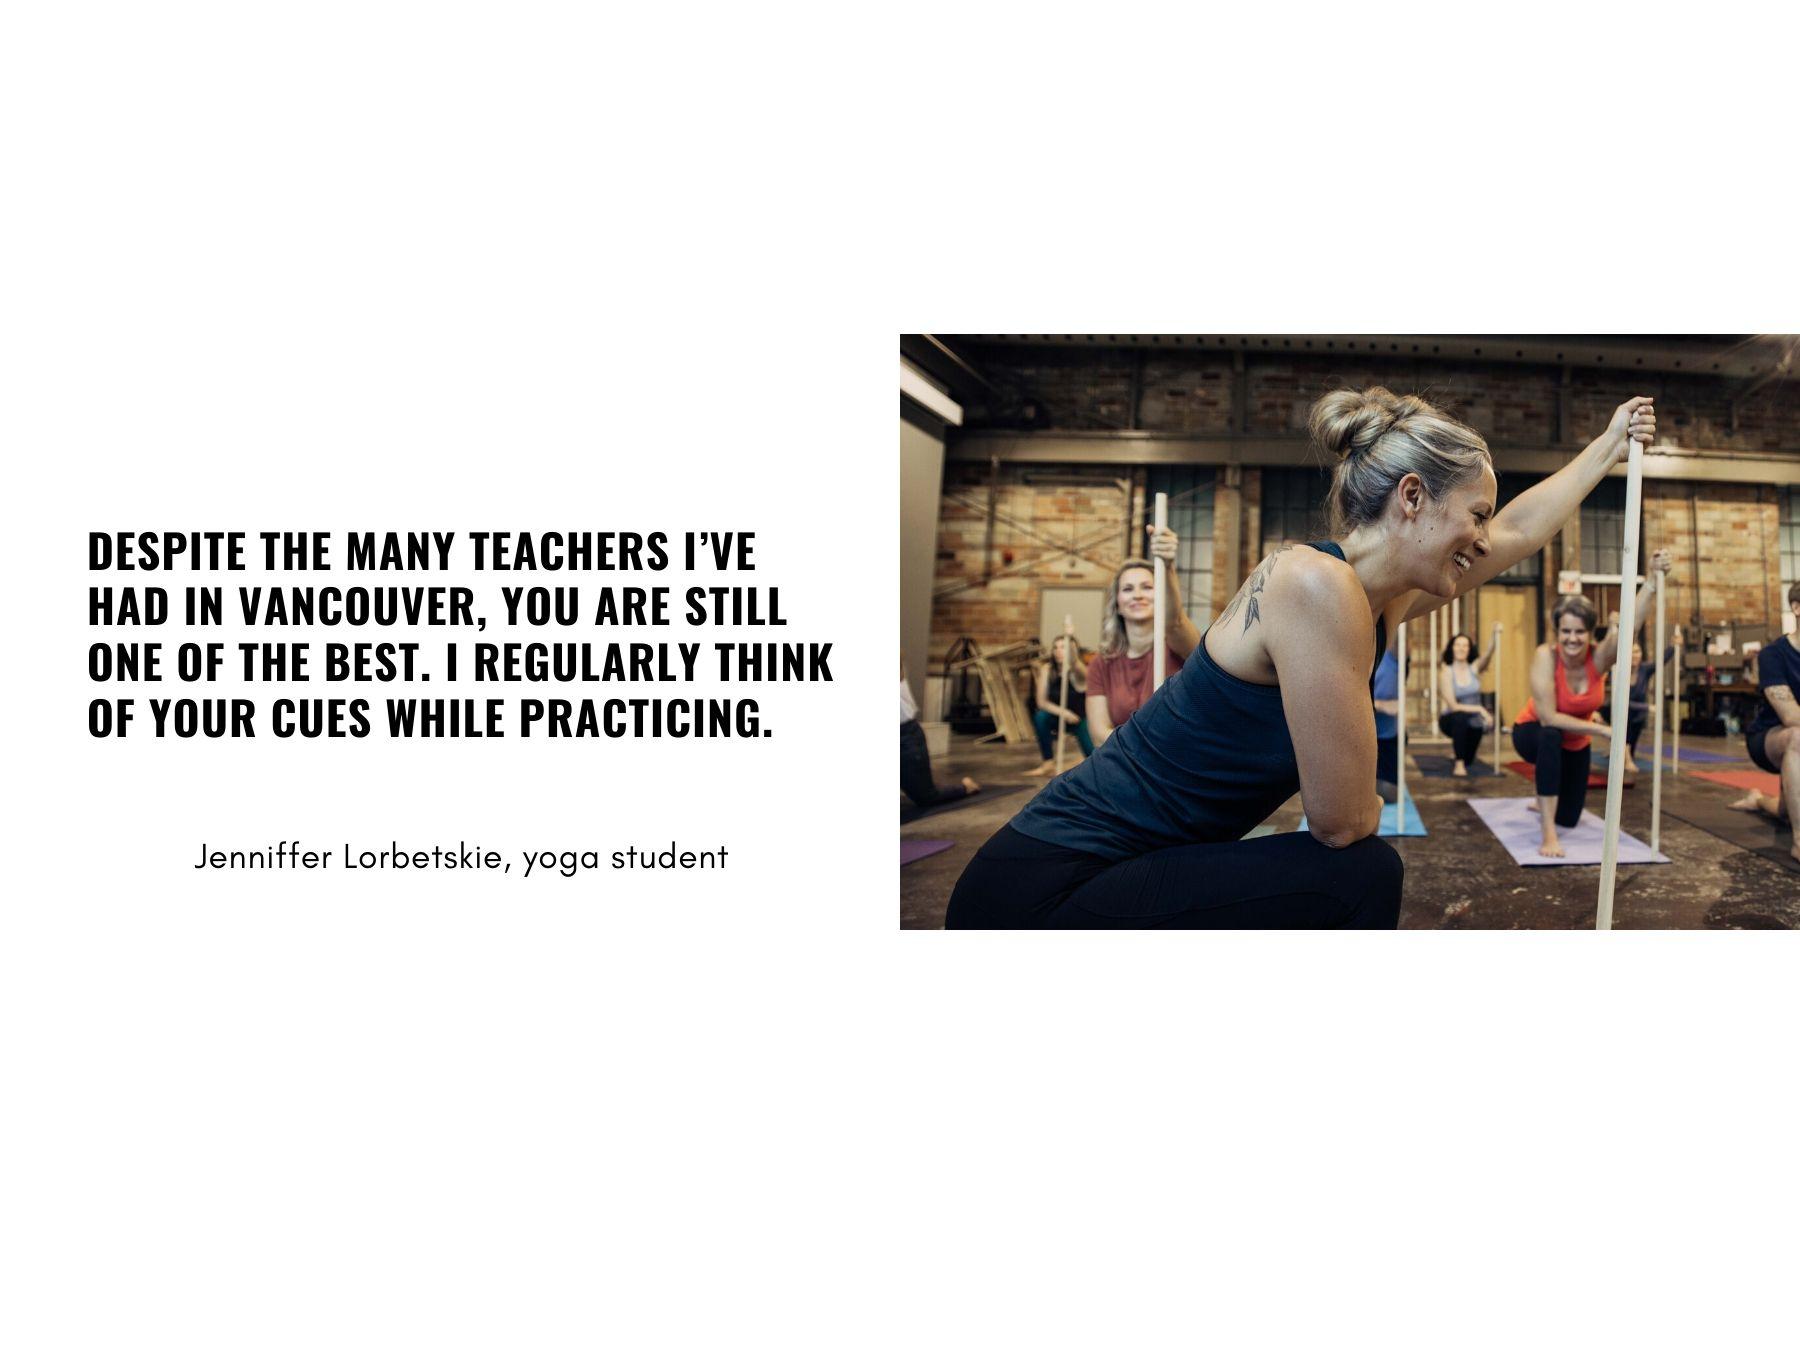 Pranalife Yoga Teacher Training with Asia Nelson in Kitchener Waterloo